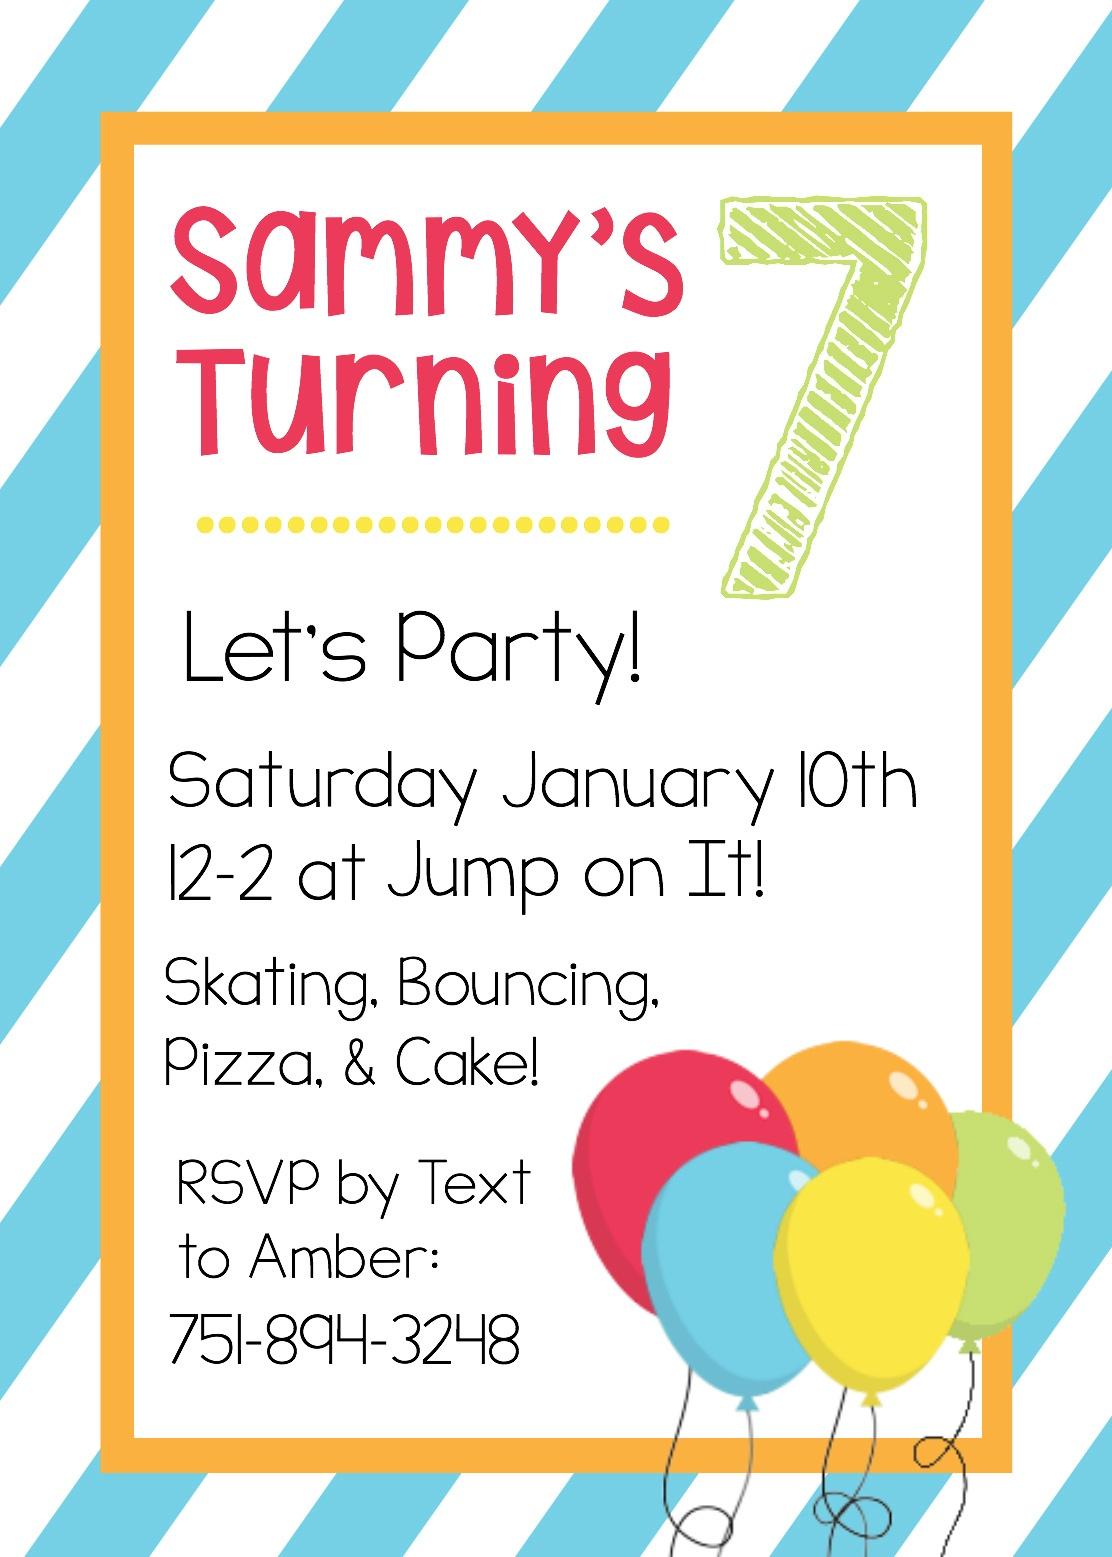 Free Printable Birthday Invitation Templates - Free Printable Girl Birthday Party Invitations